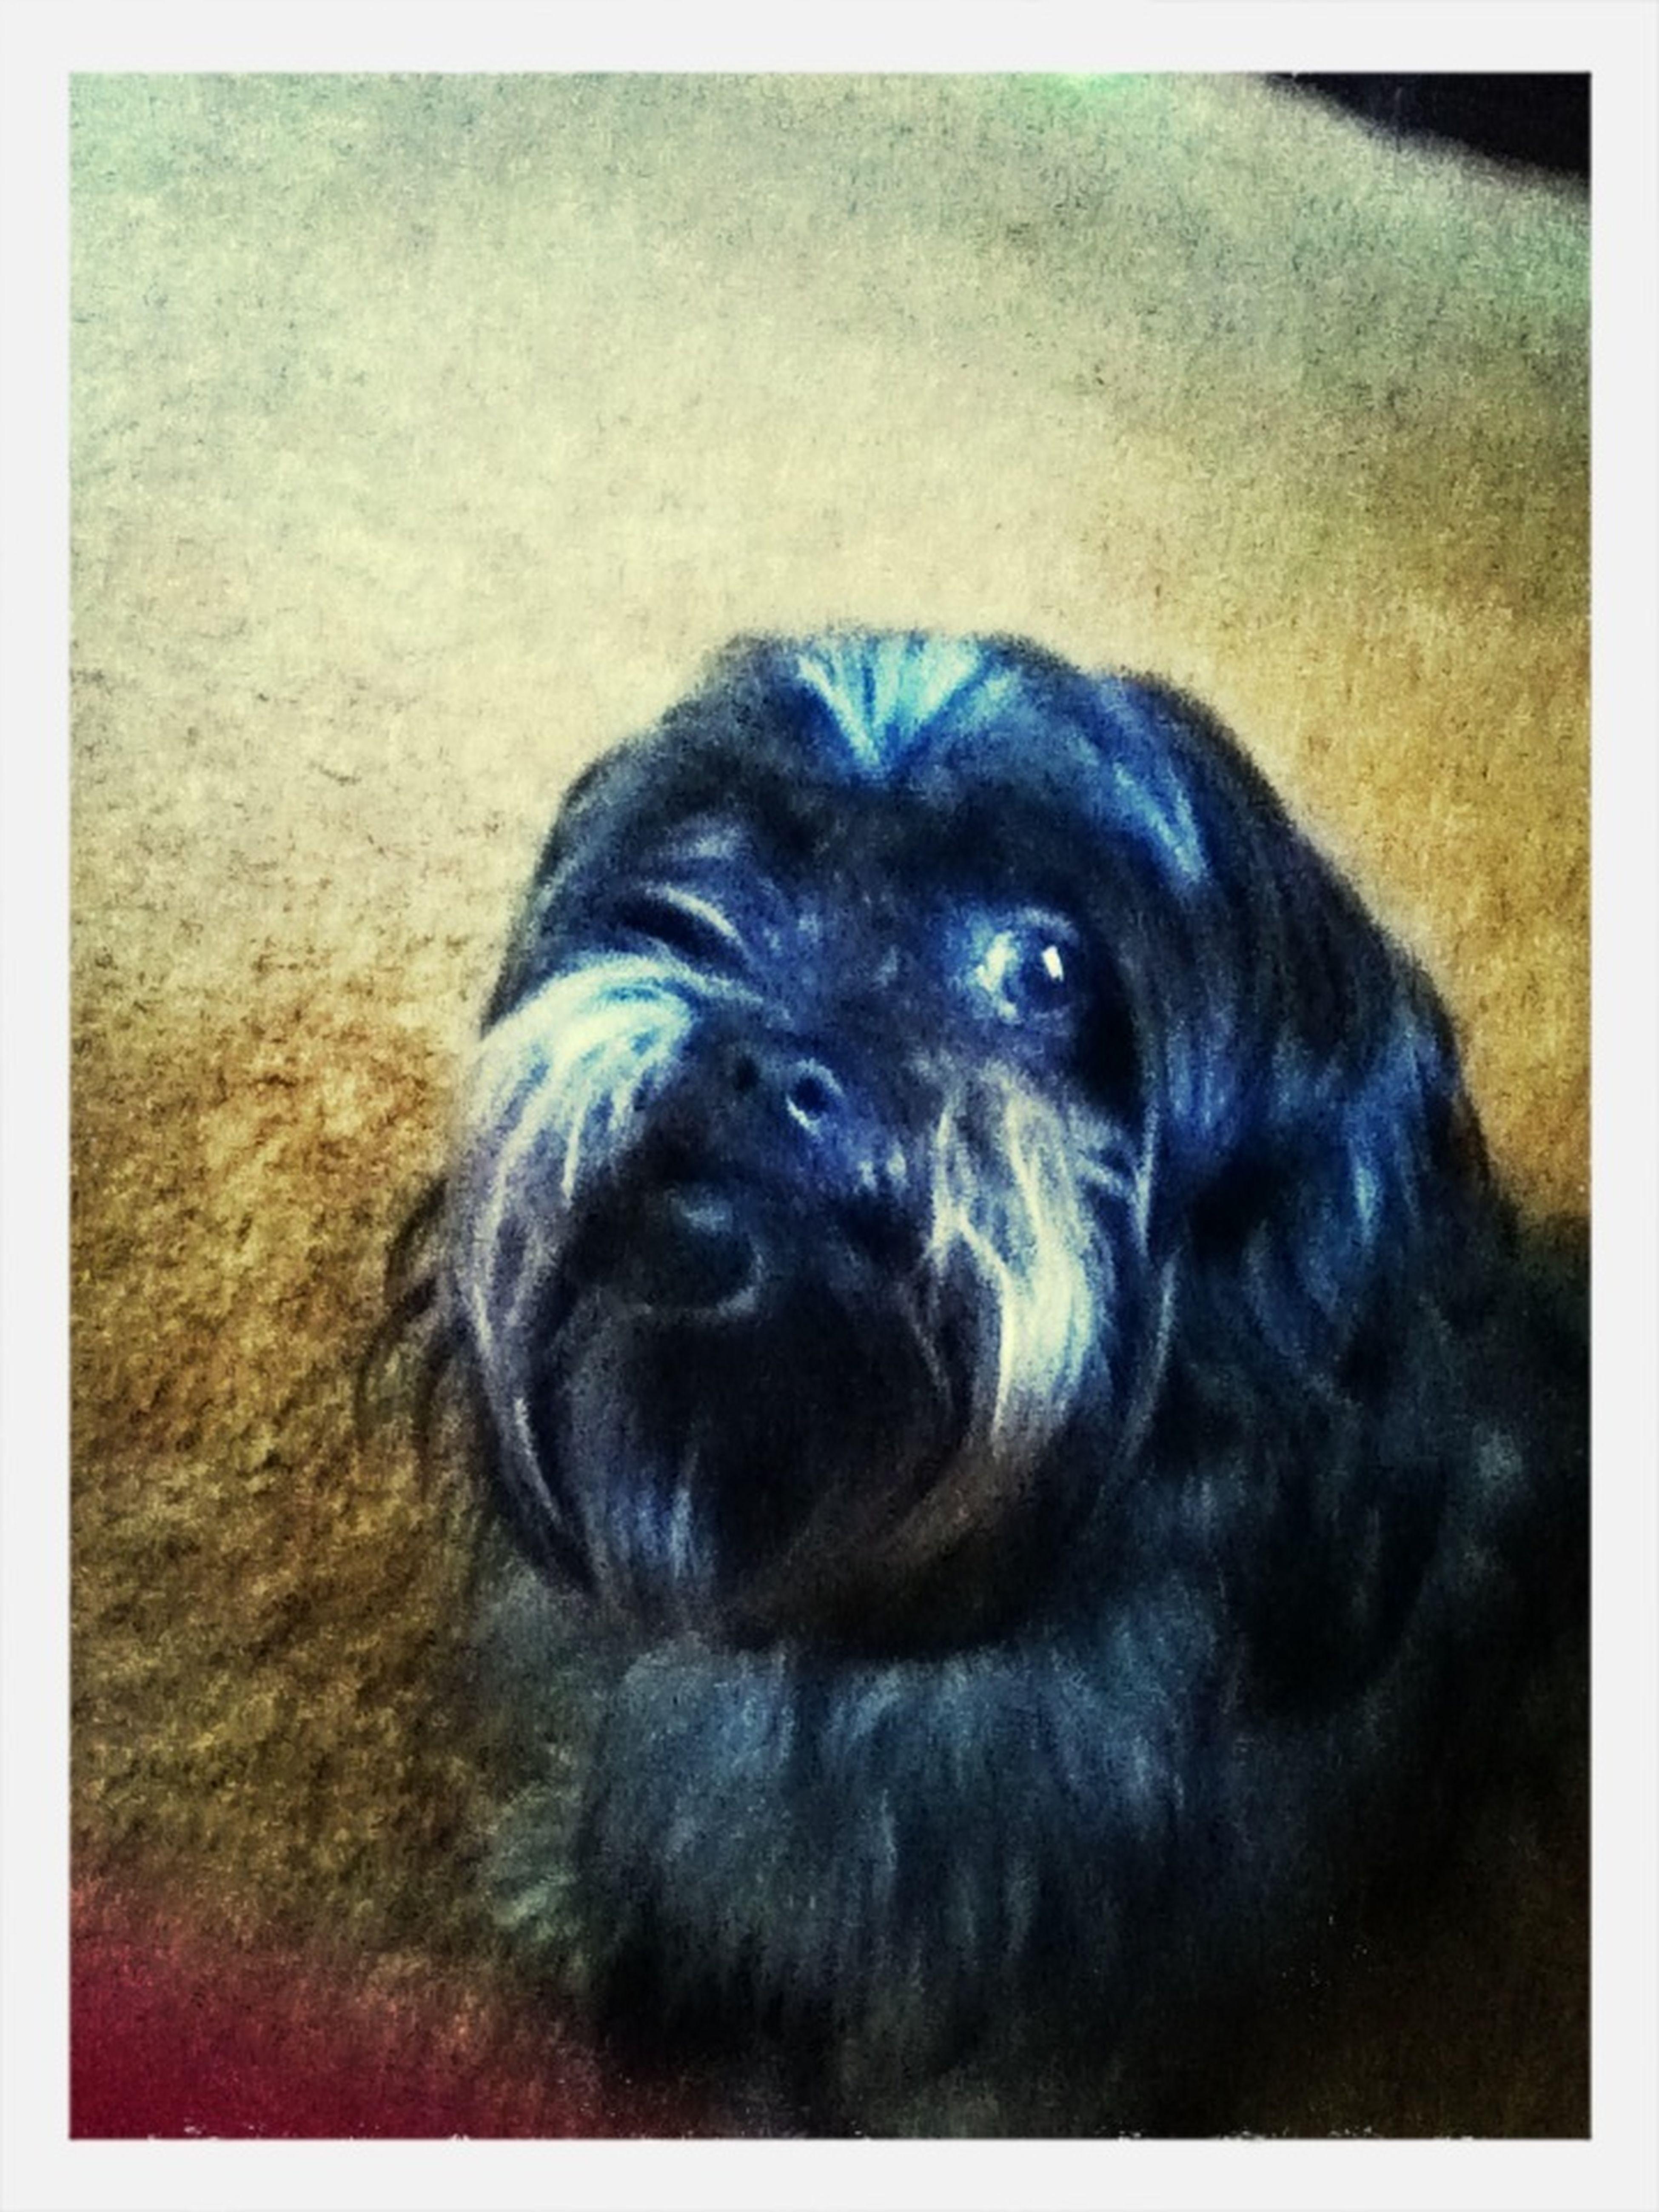 My Dog 4ever